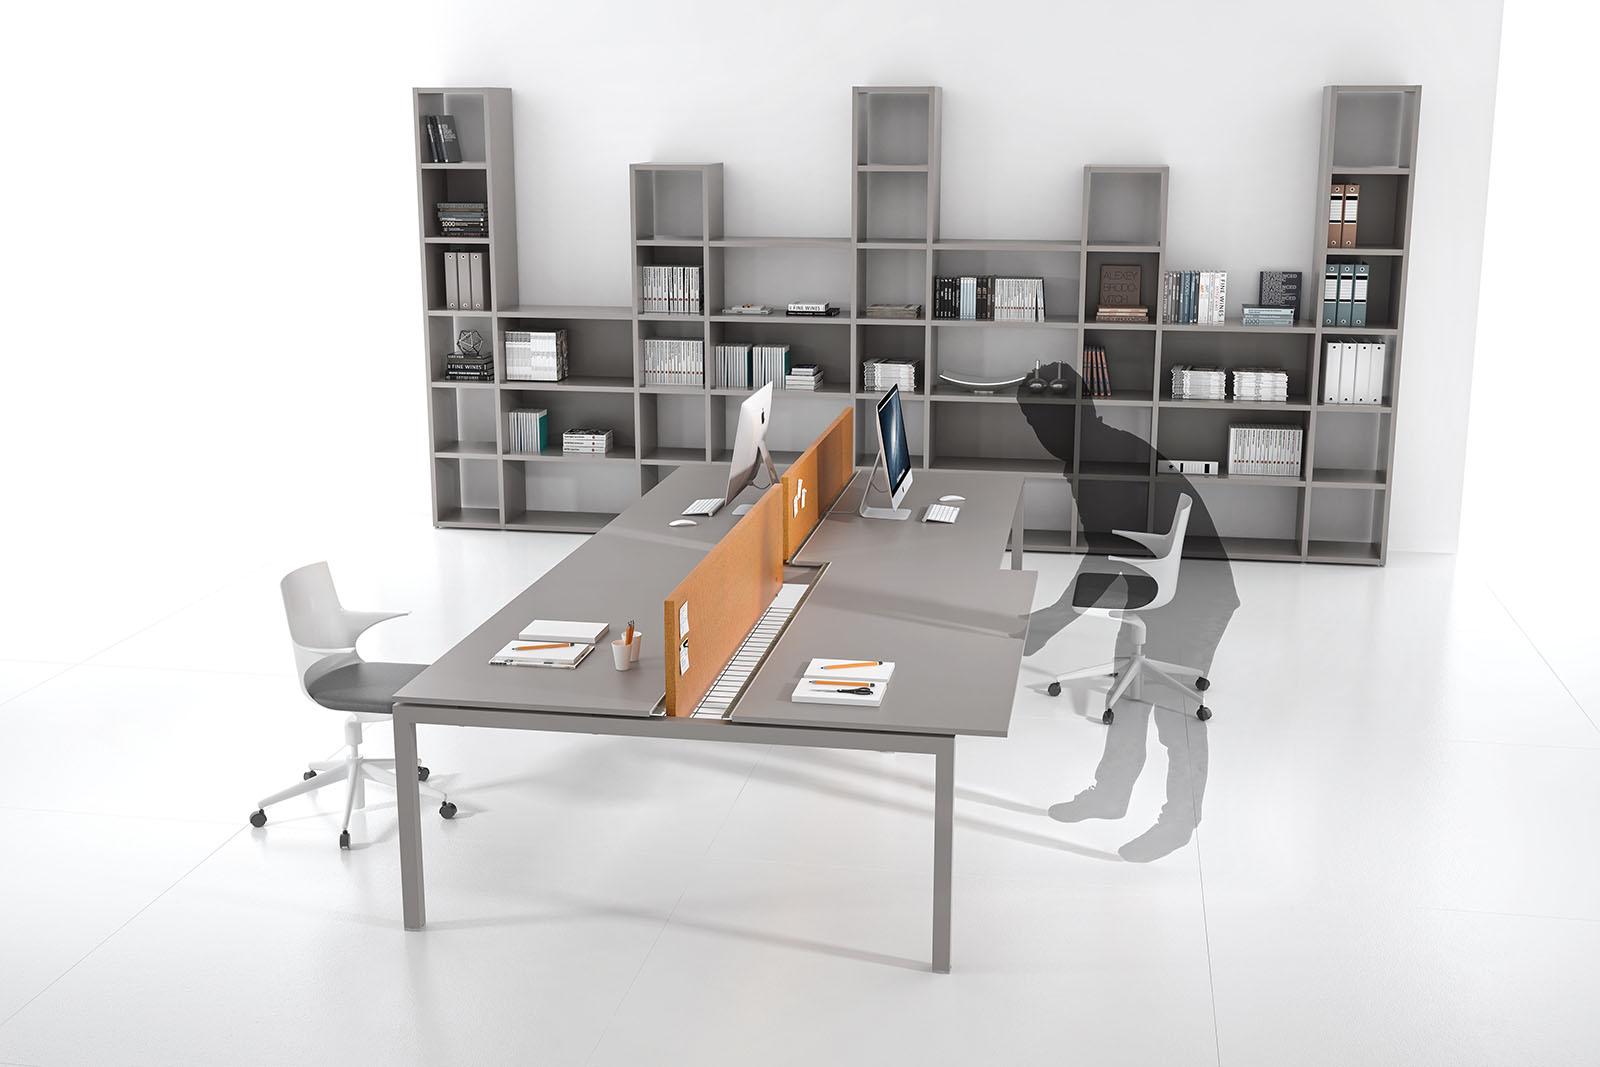 Mobilier Collaboratif Operationnel Mobilier Design Design